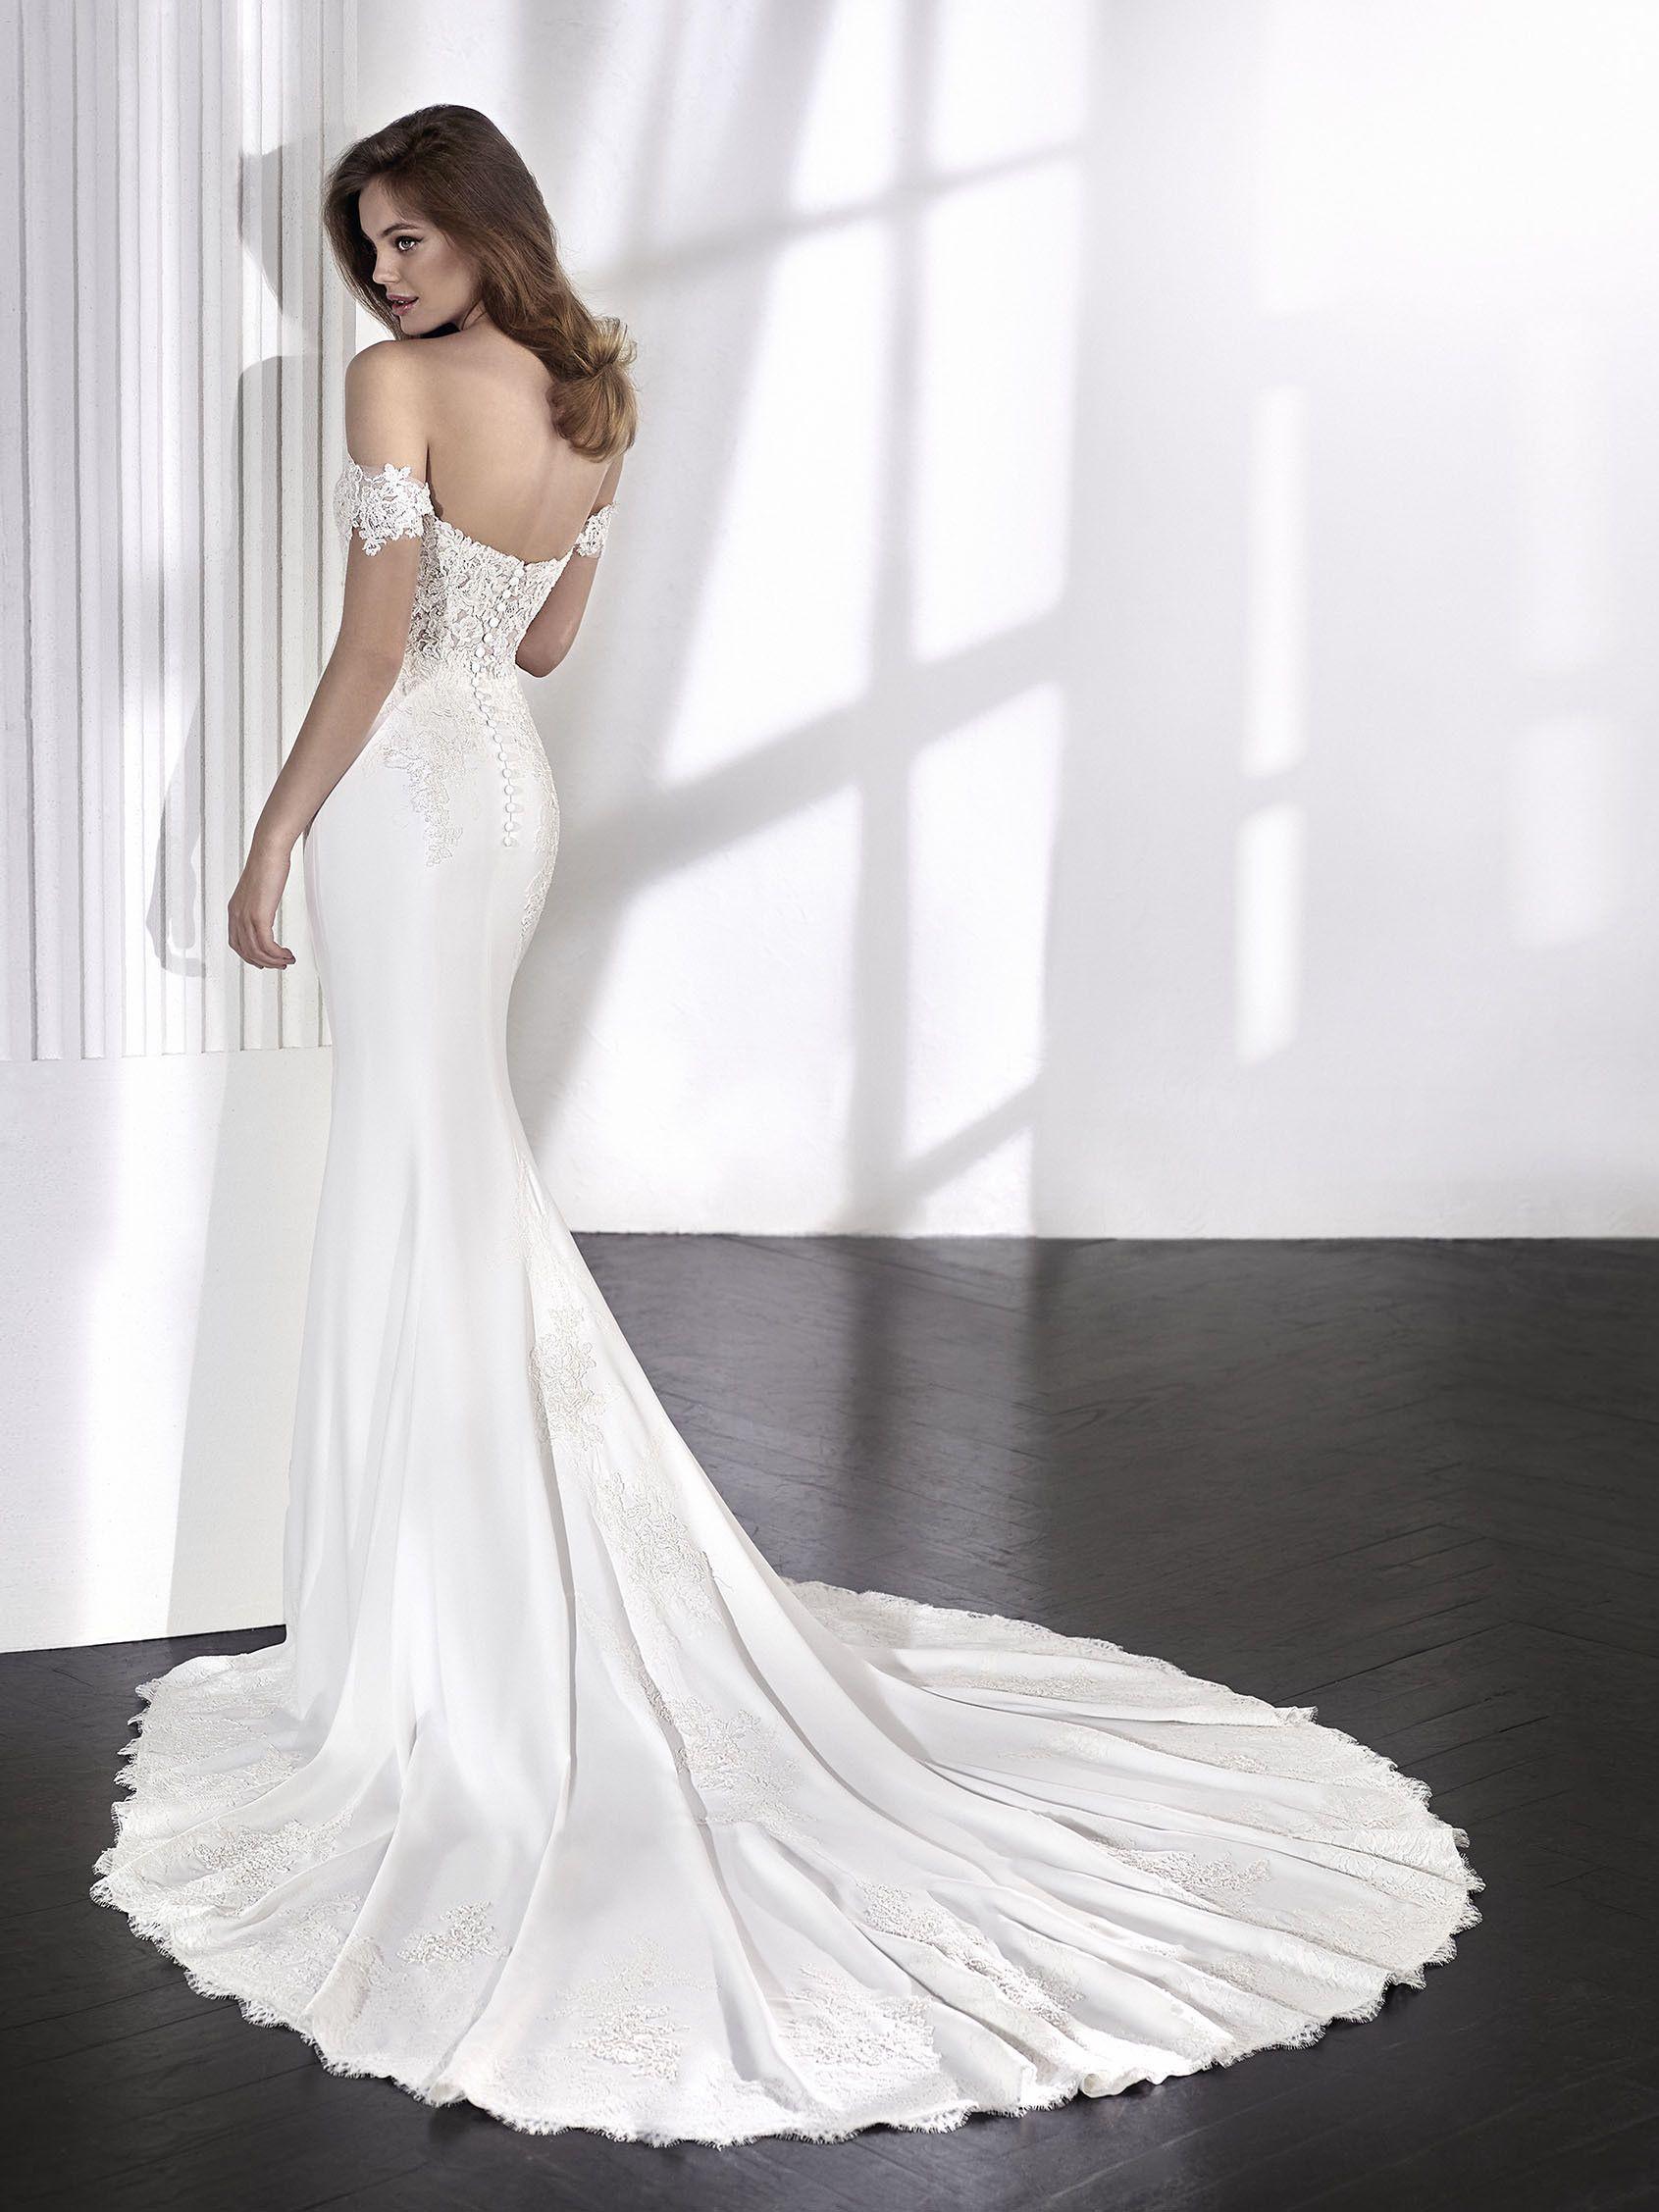 Laelia Sweetheart Neckline Pronovias Wedding Dress St Patrick Wedding Dress Used Wedding Dresses